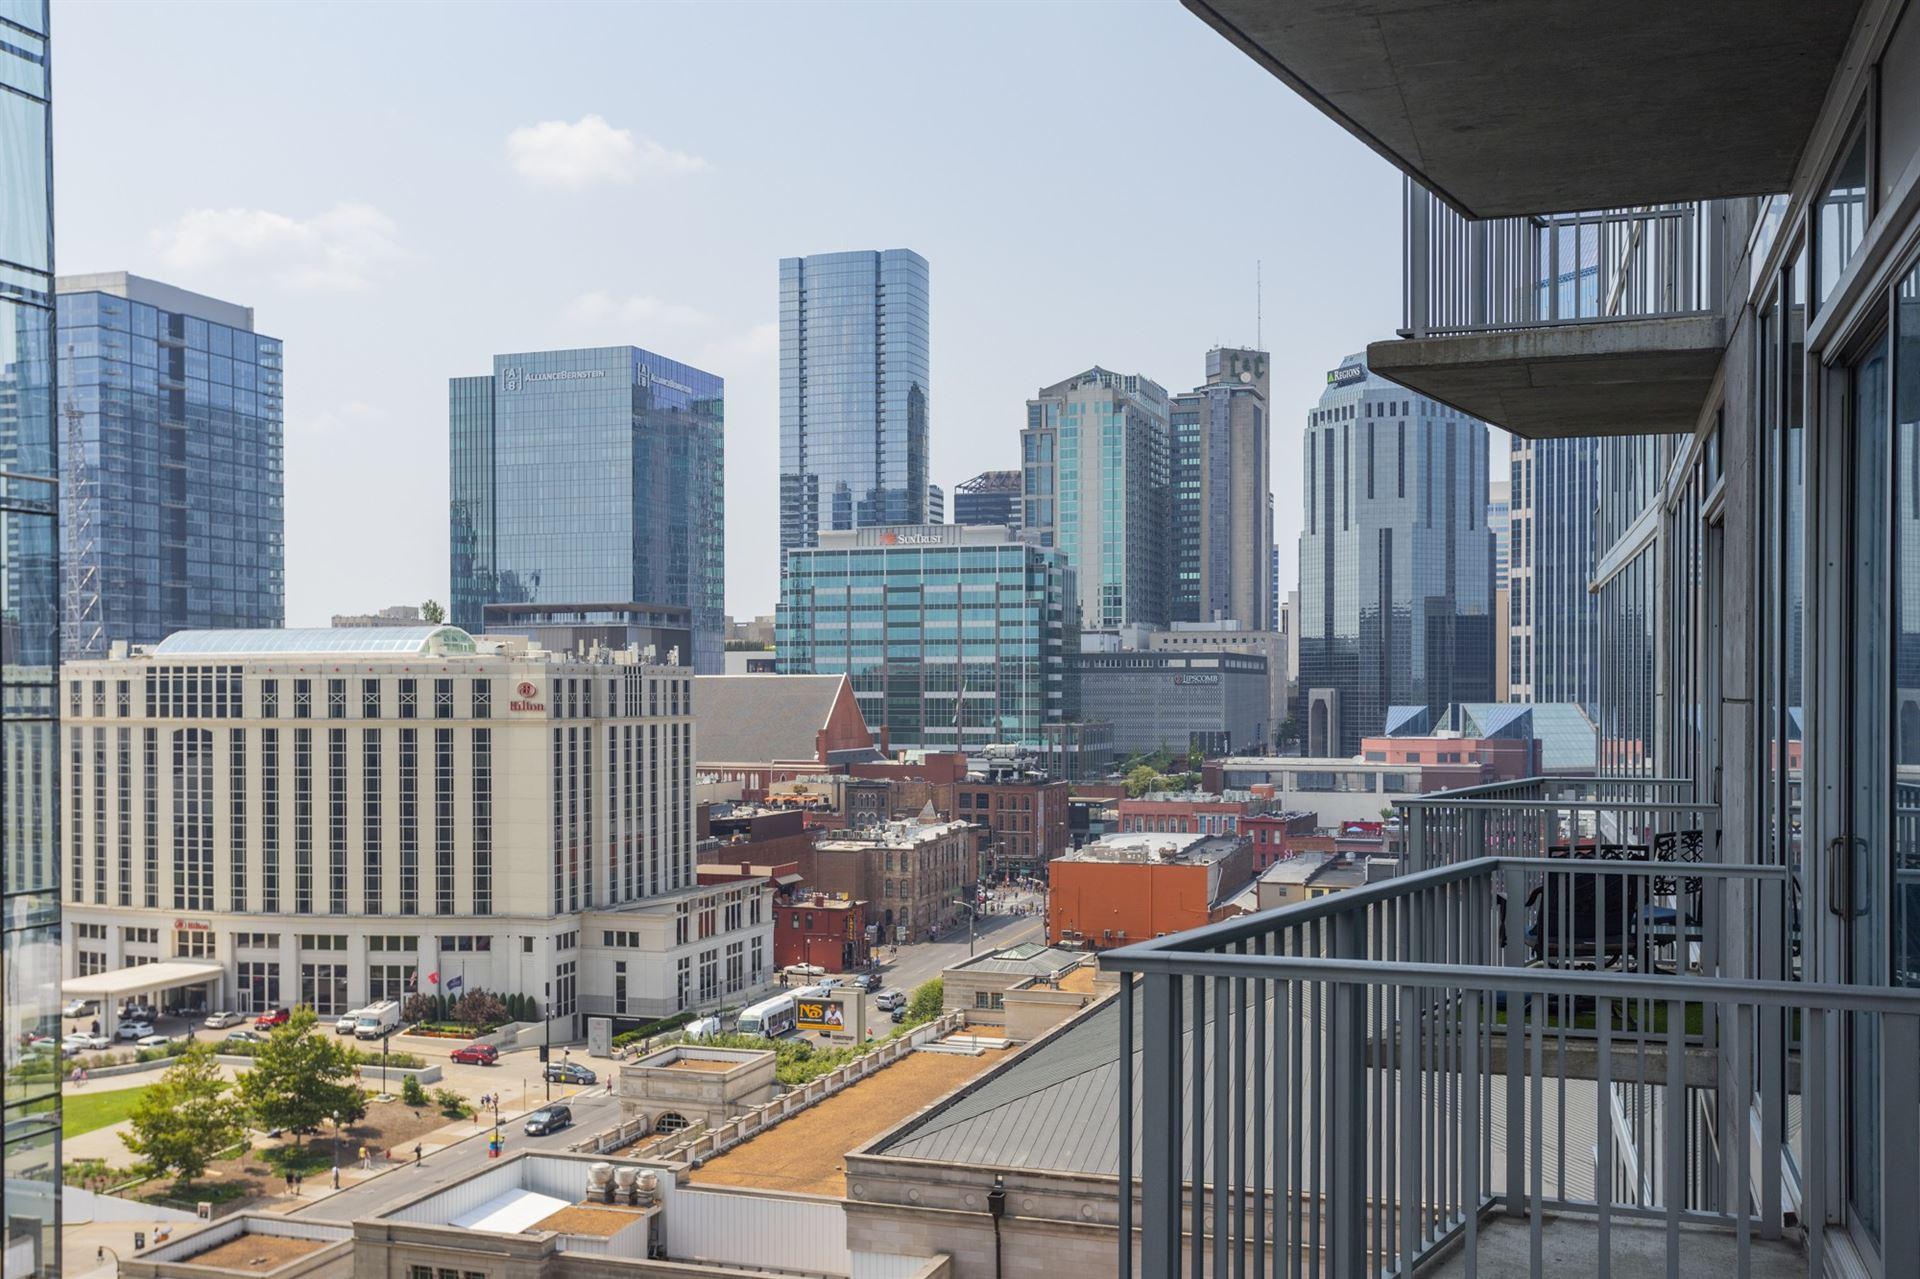 Photo of 301 Demonbreun St #1101, Nashville, TN 37201 (MLS # 2275930)